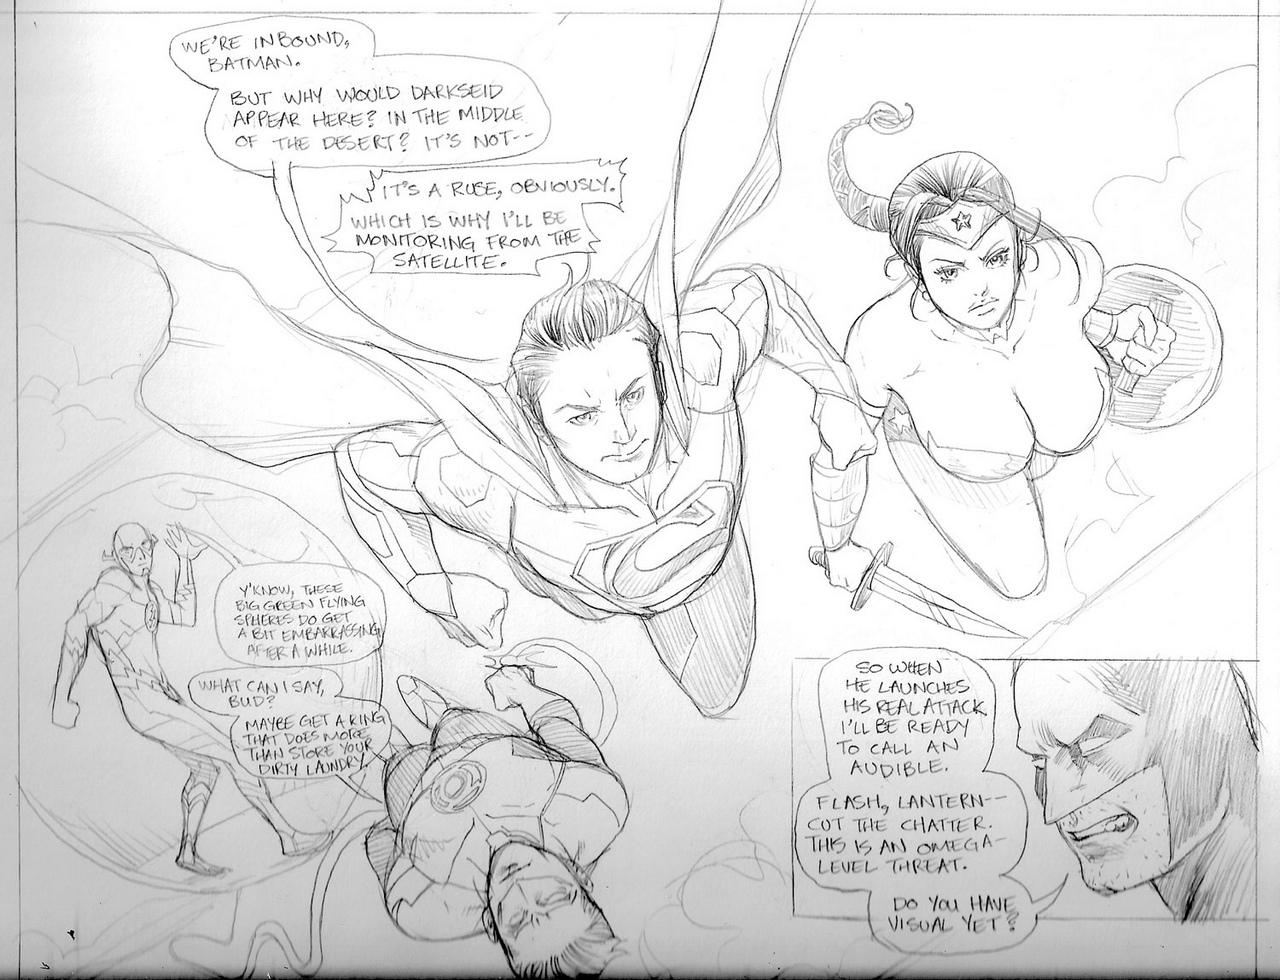 Whores-Of-Darkseid-1-Wonder-Woman 3 free sex comic